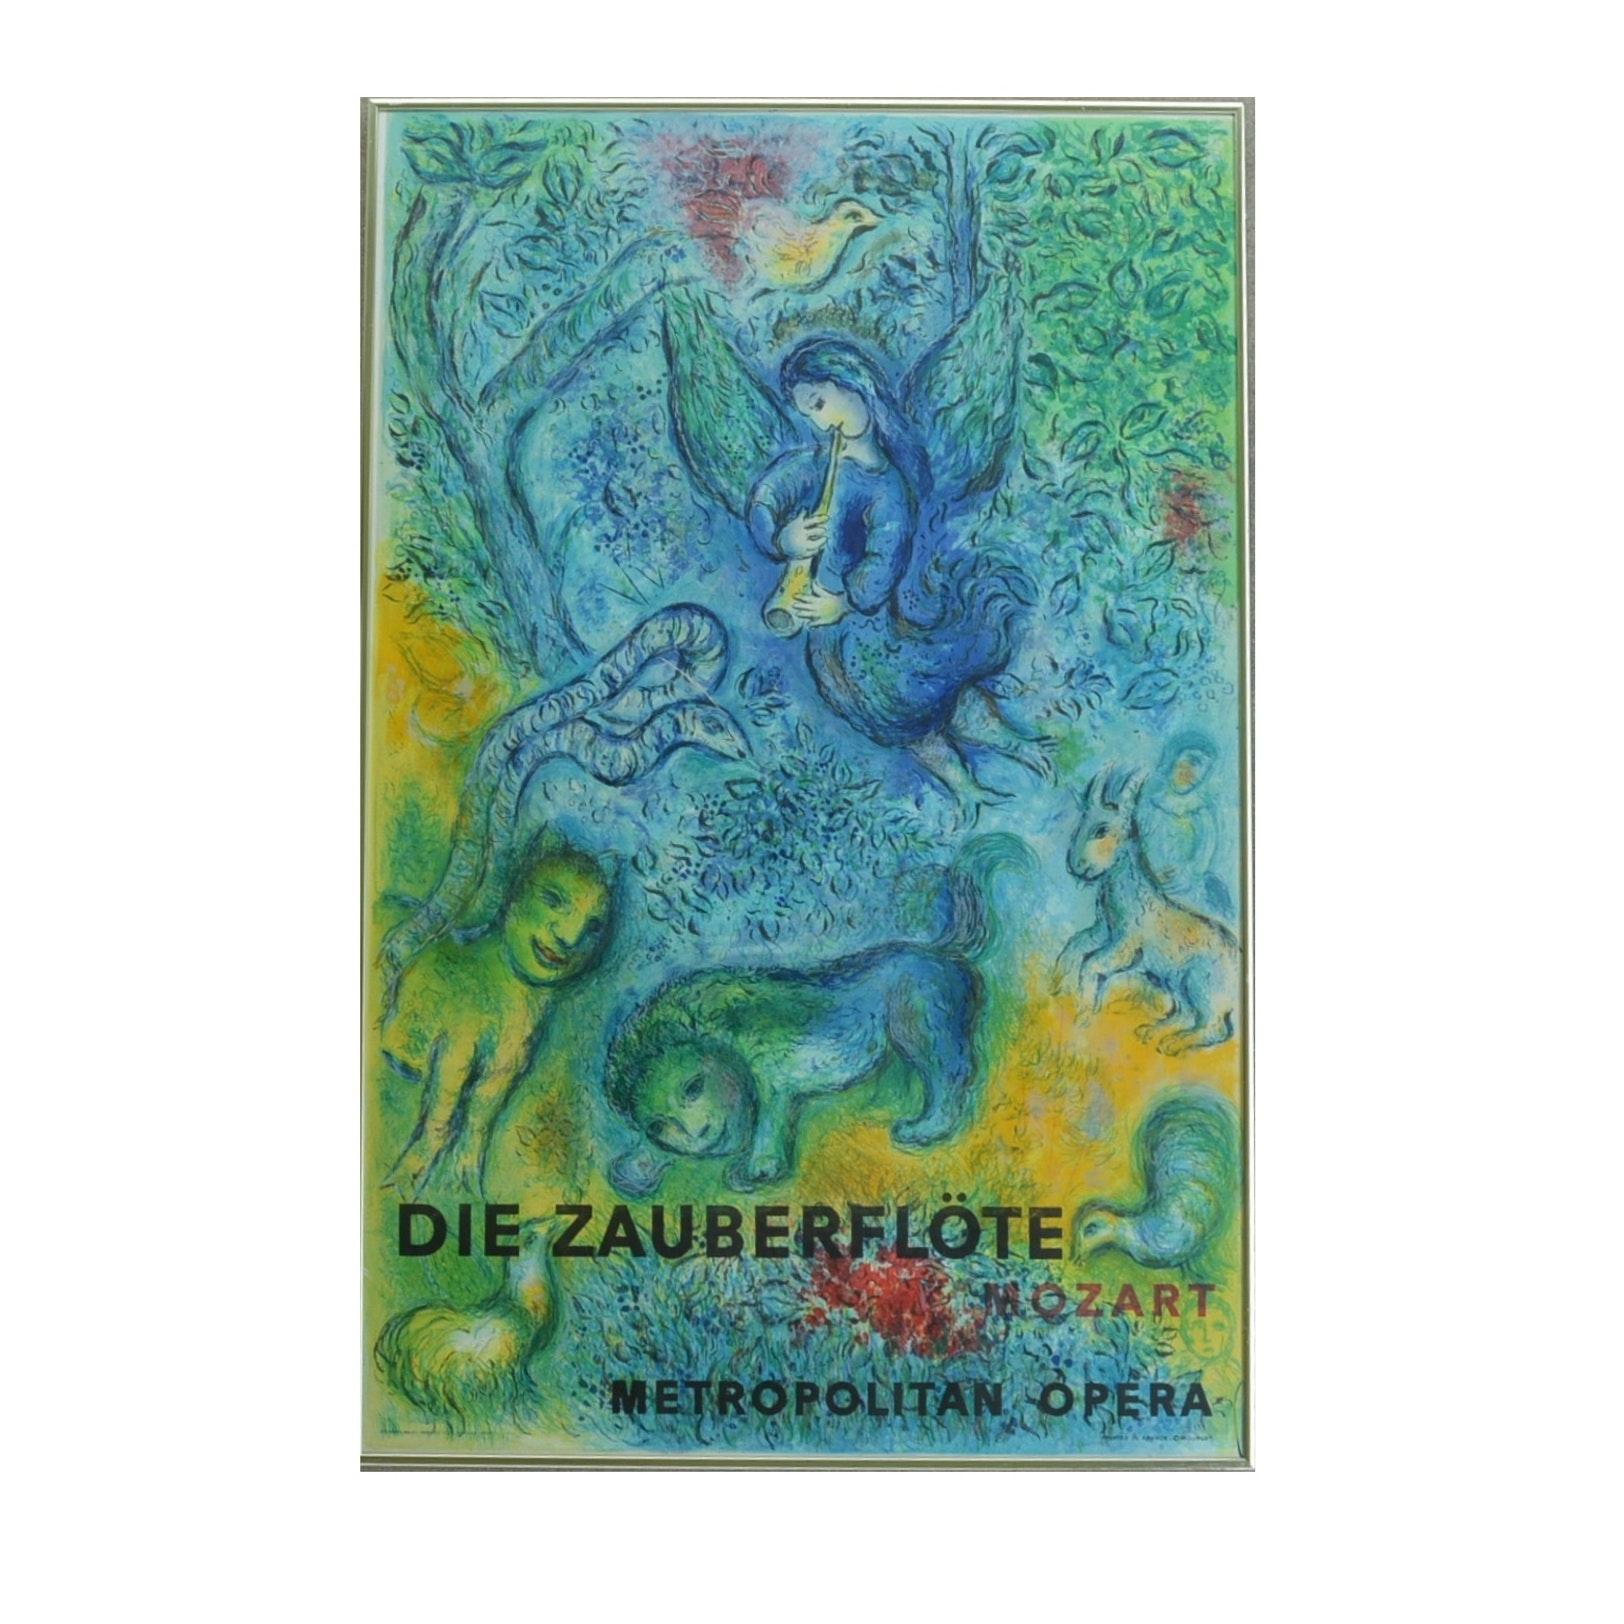 "Metropolitan Opera ""Die Zauberflöte"" Lithographic Poster after Marc Chagall"